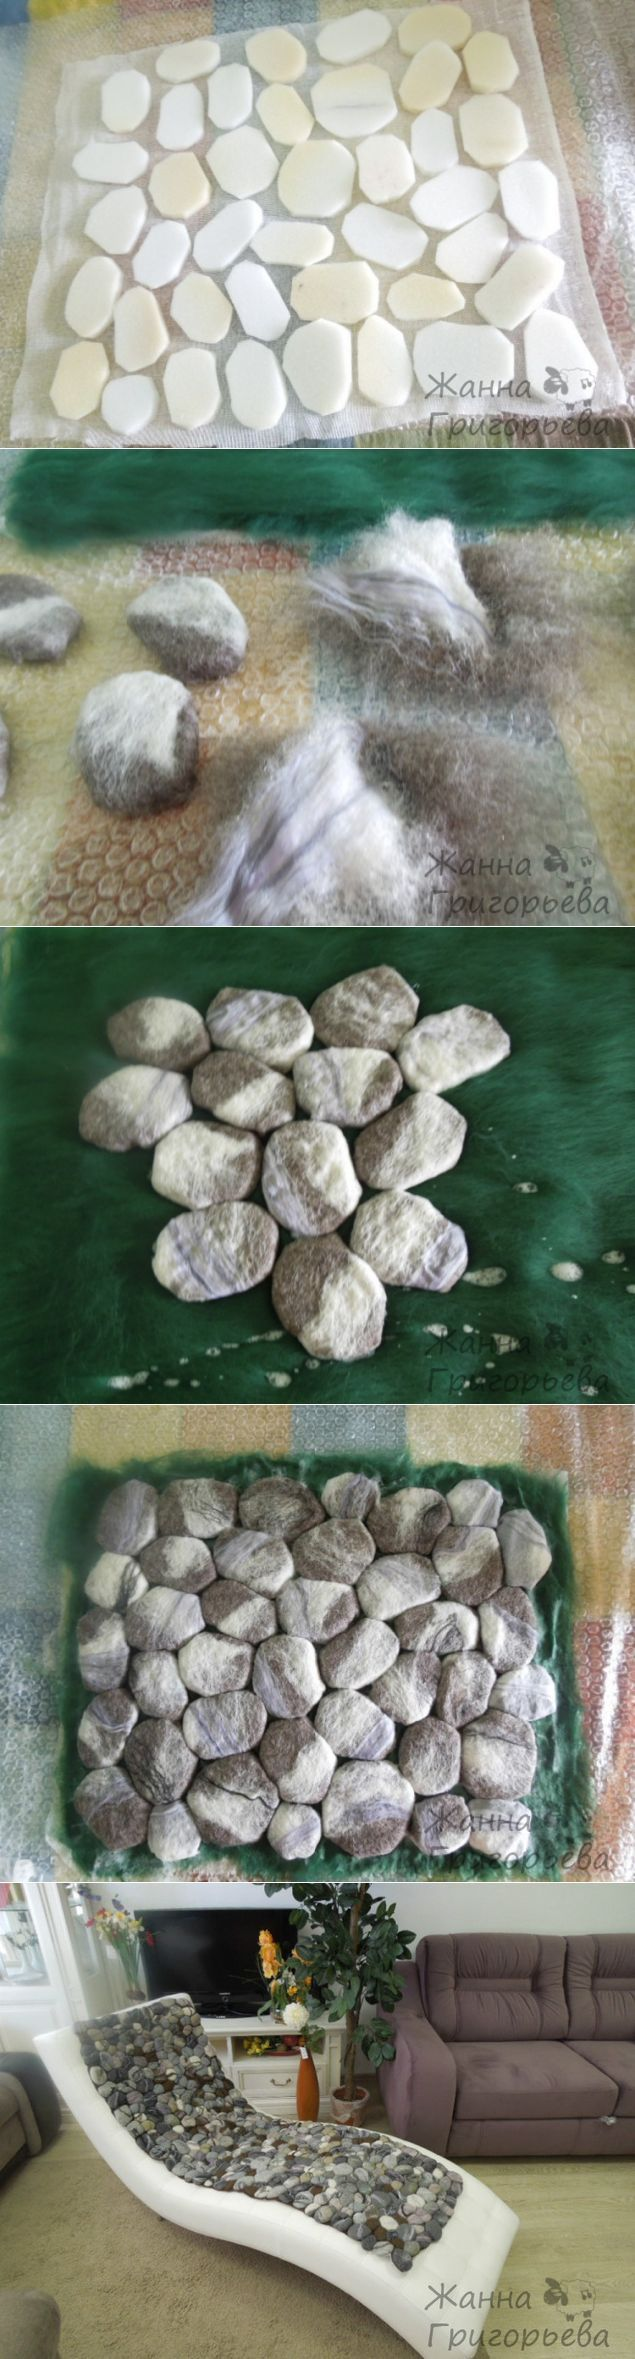 Теплые камушки - Ярмарка Мастеров - ручная работа, handmade